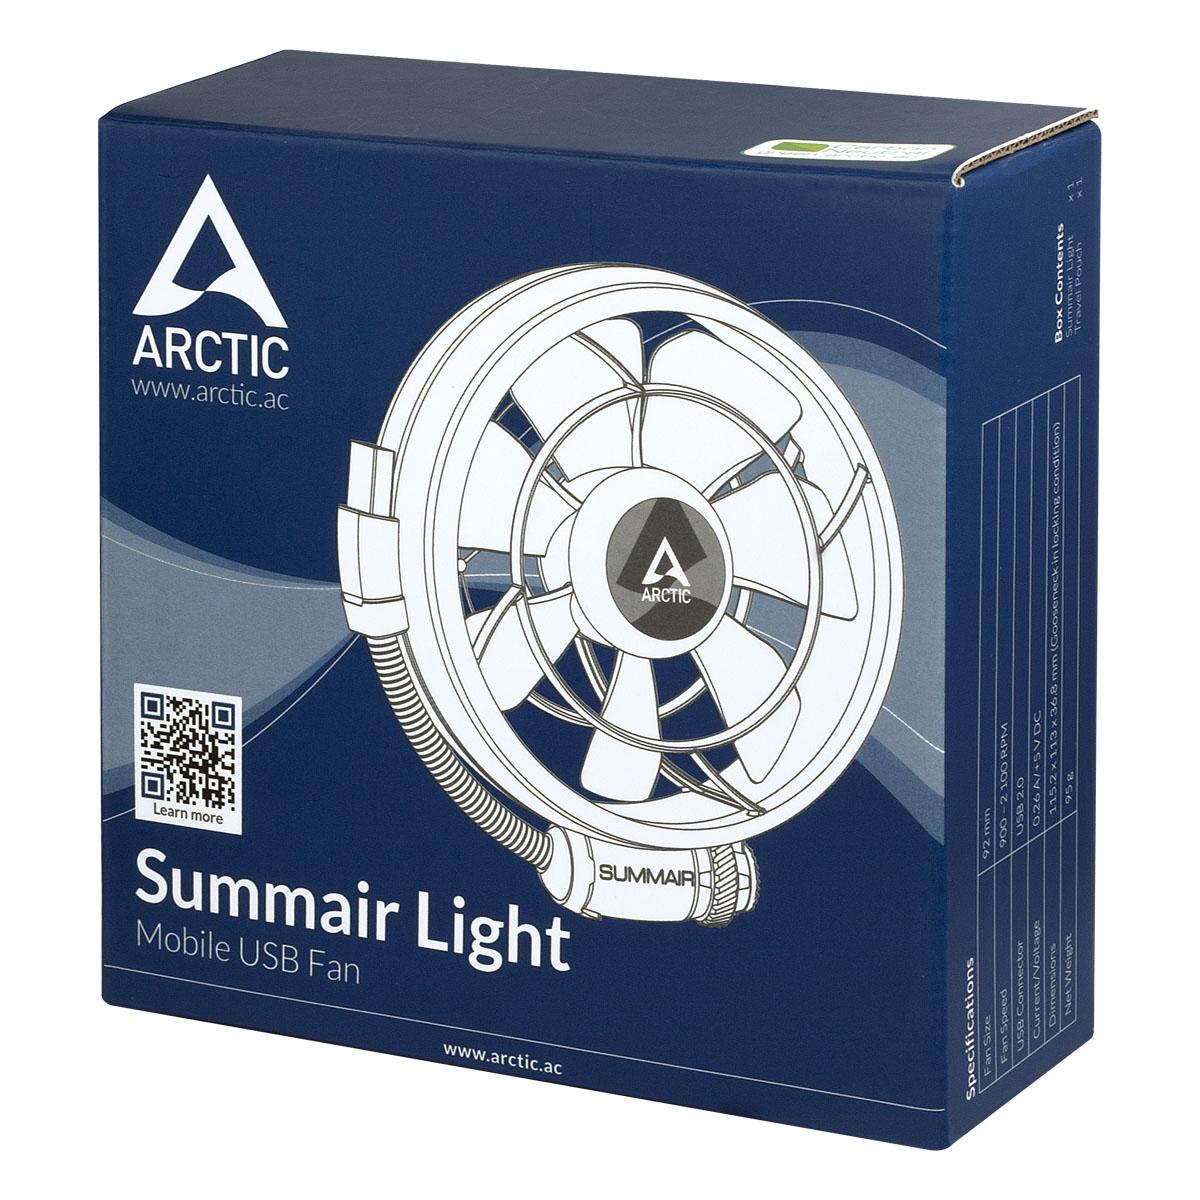 Ventilator USB de birou Arctic Summair Light